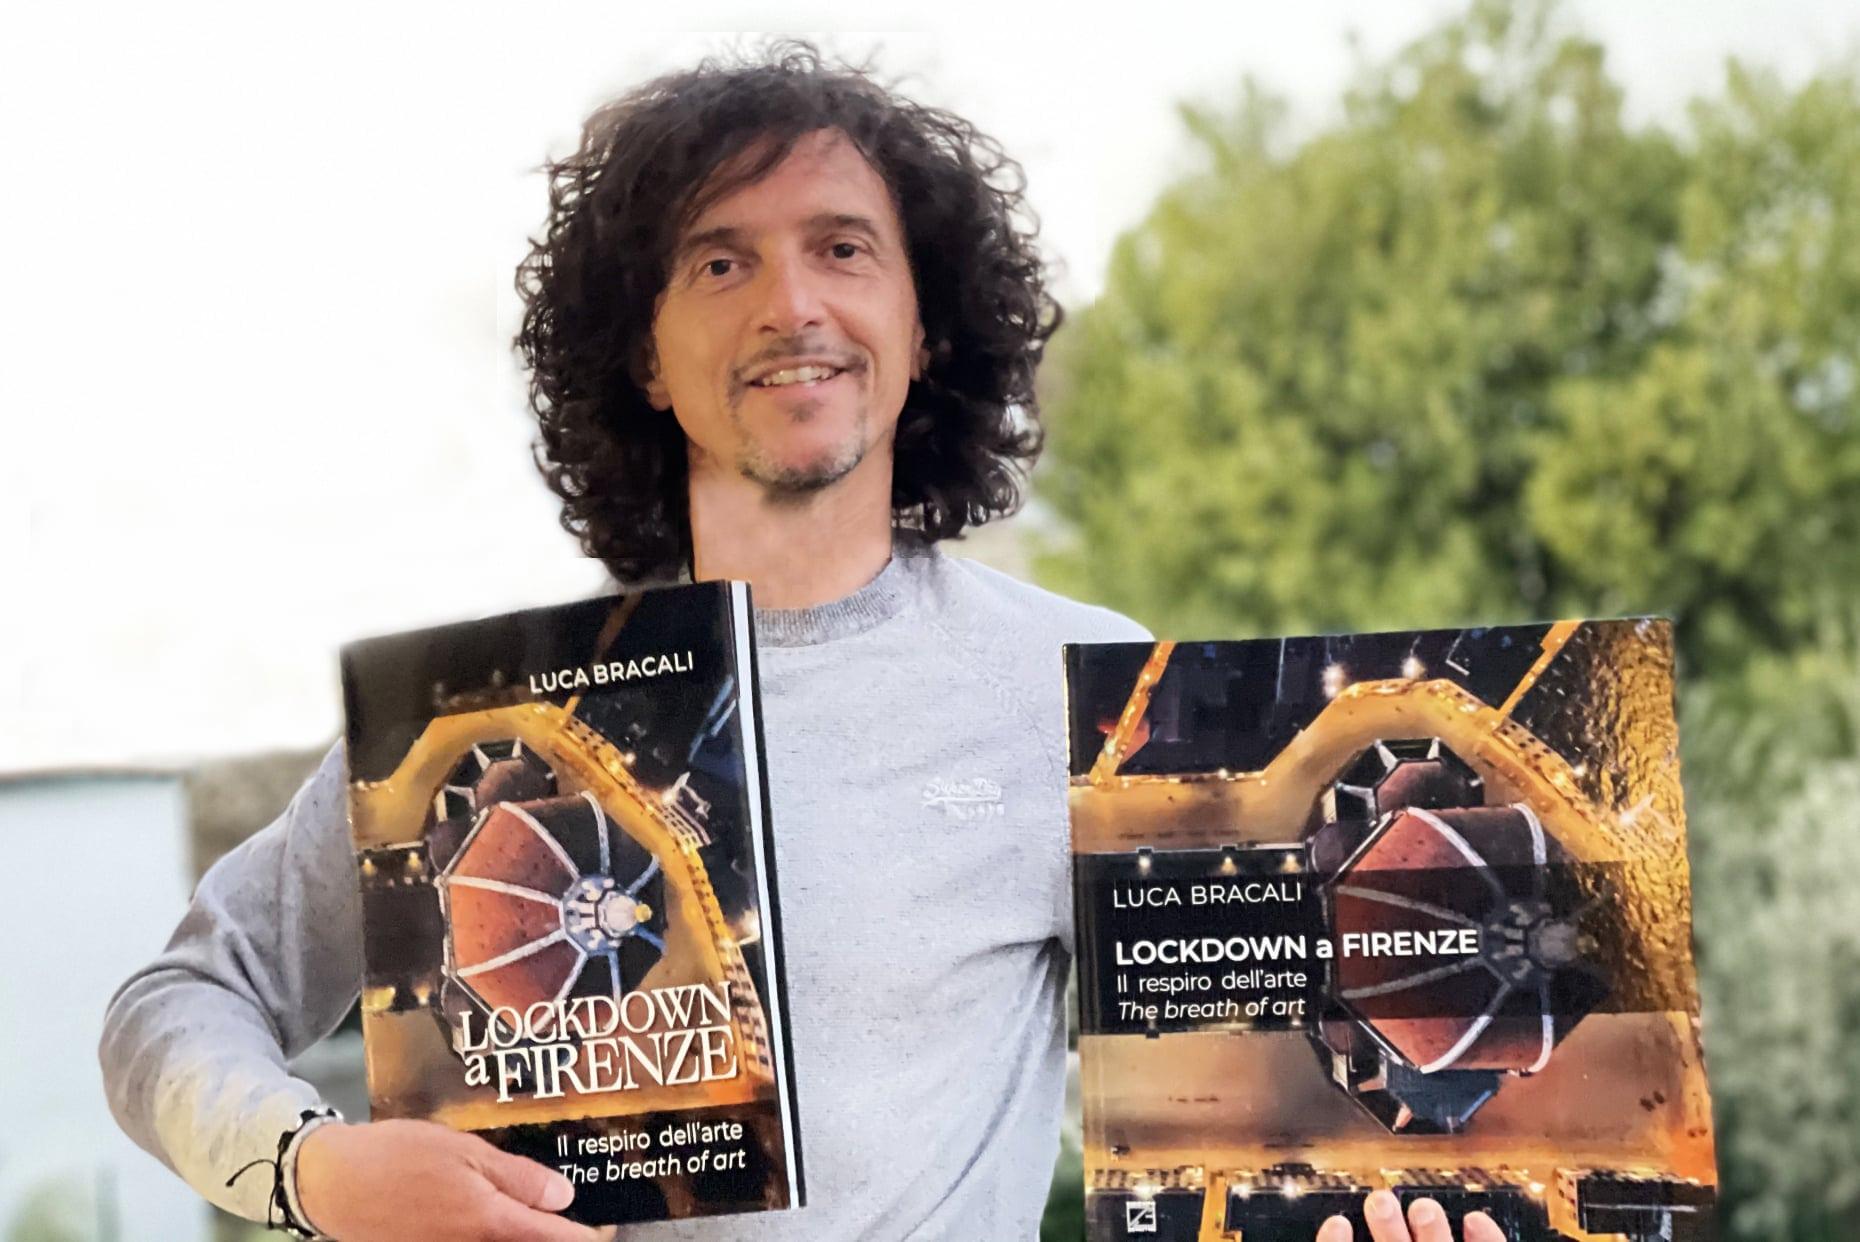 Luca Bracali libro lockdown firenze